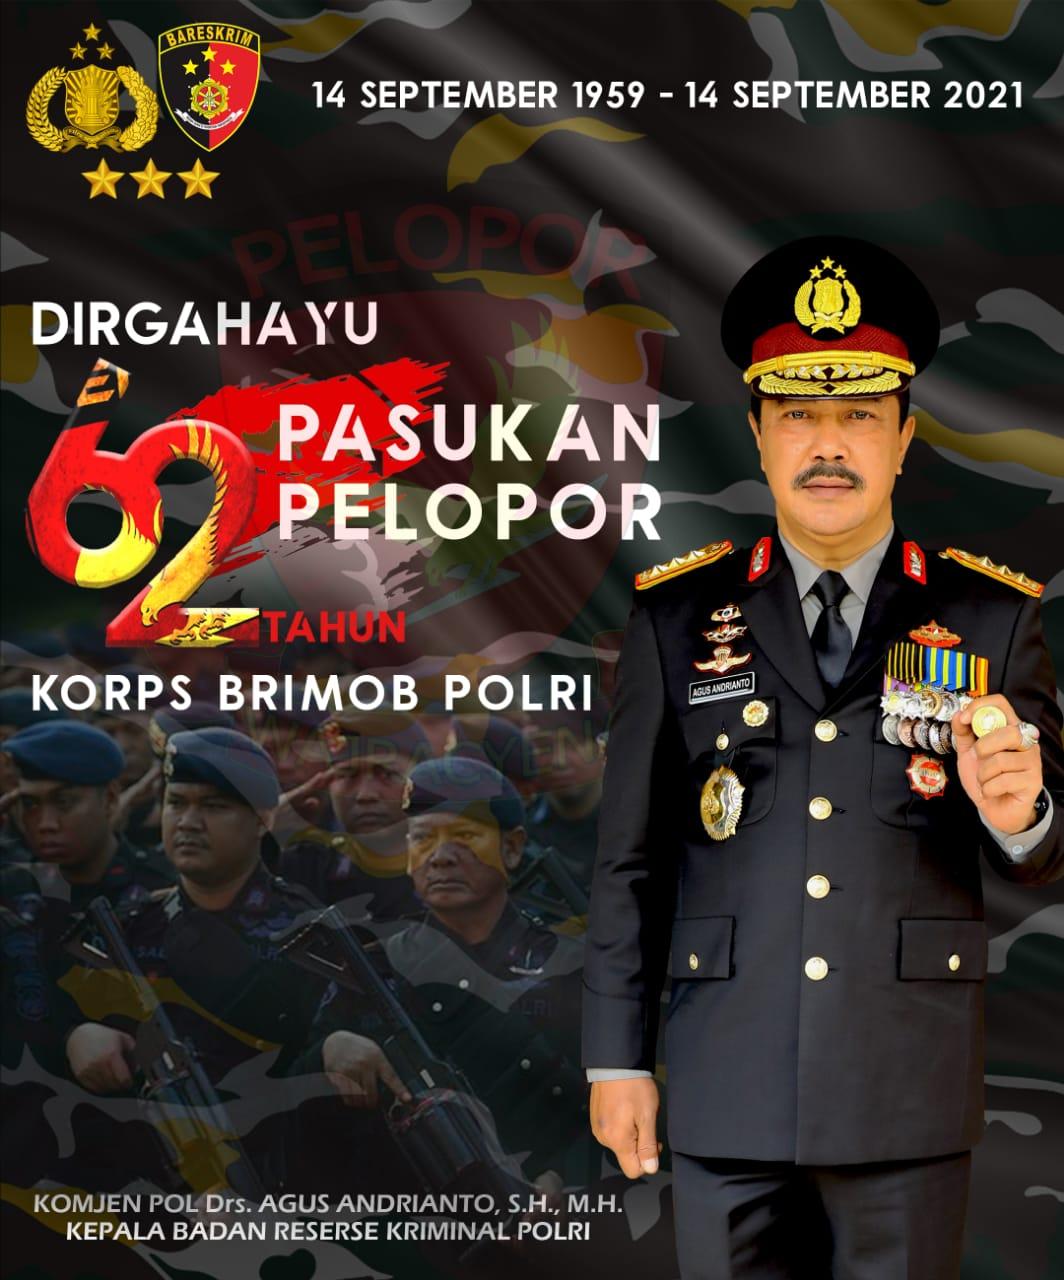 62 Tahun Korps Brimob